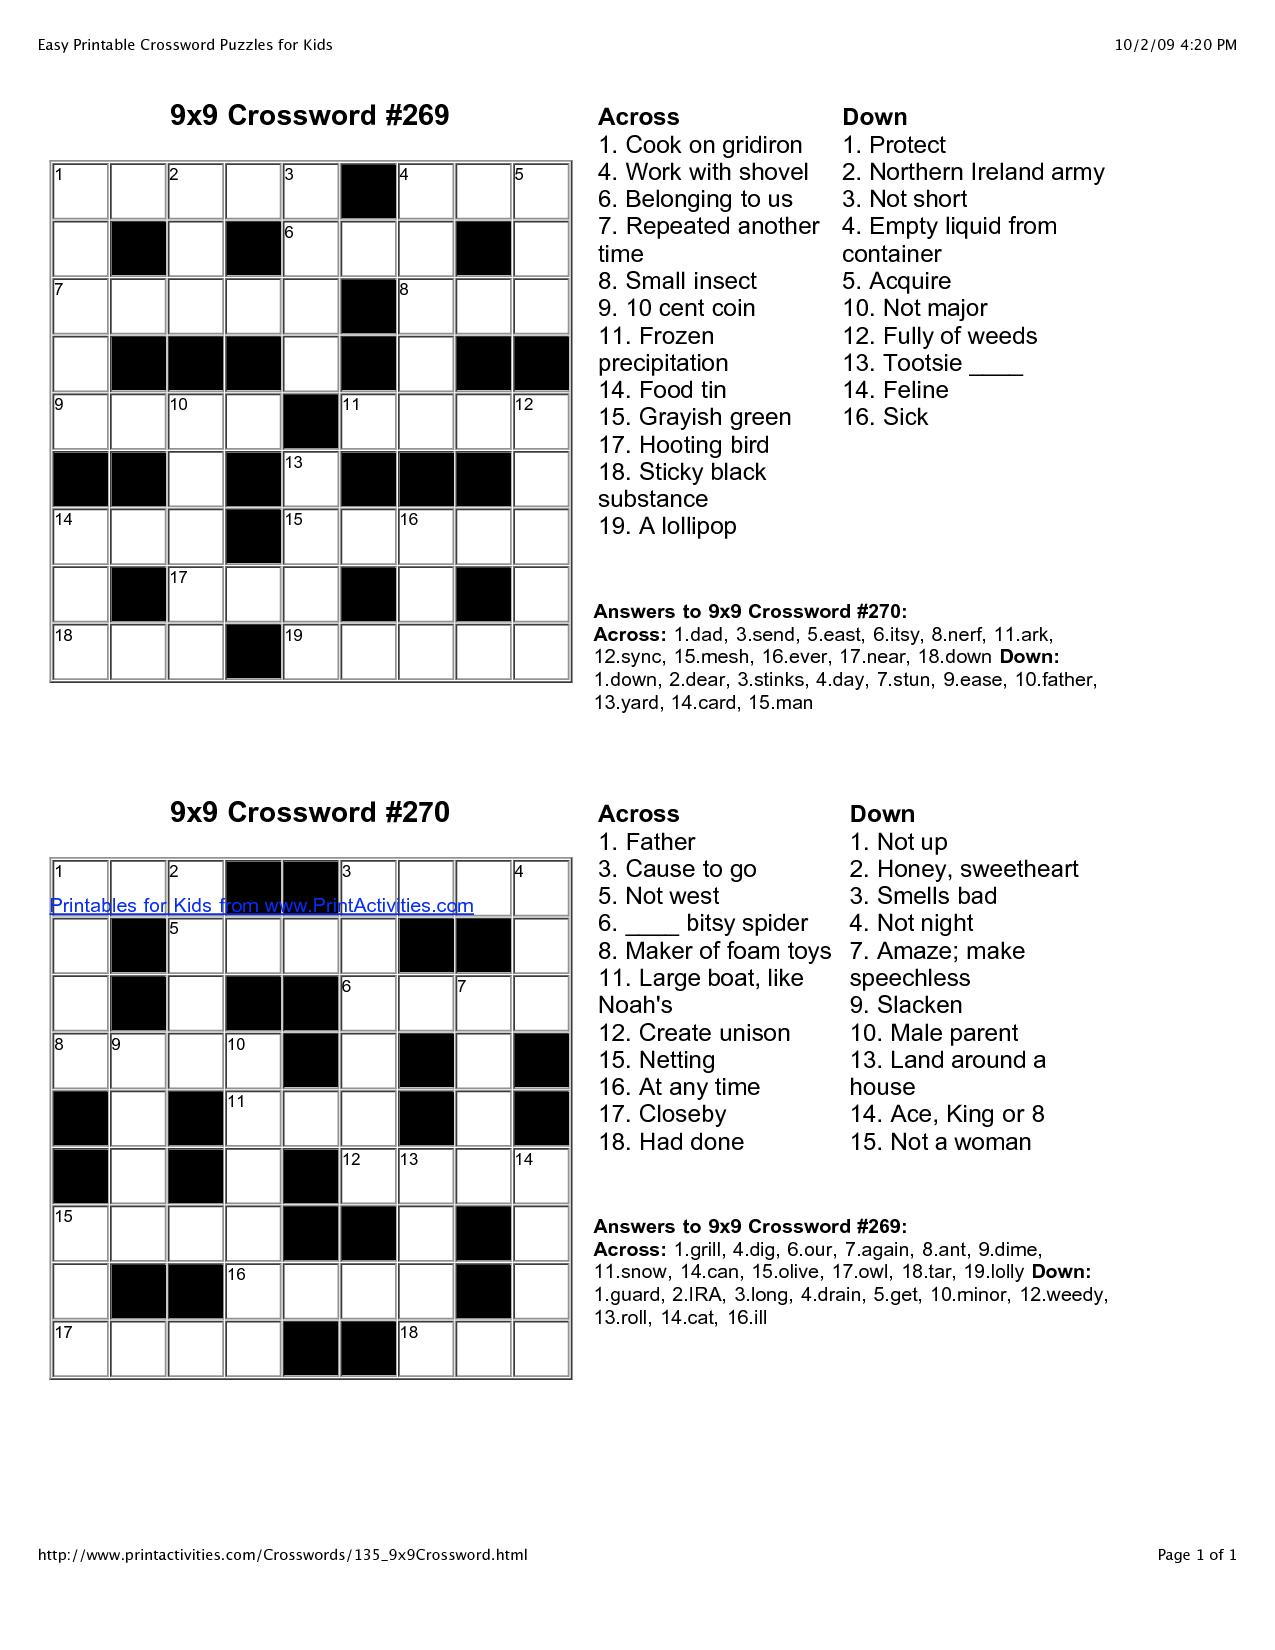 Free Fill In Crossword Puzzle Maker Crosswords Easy Printable - Free Printable Fill In Puzzles Online